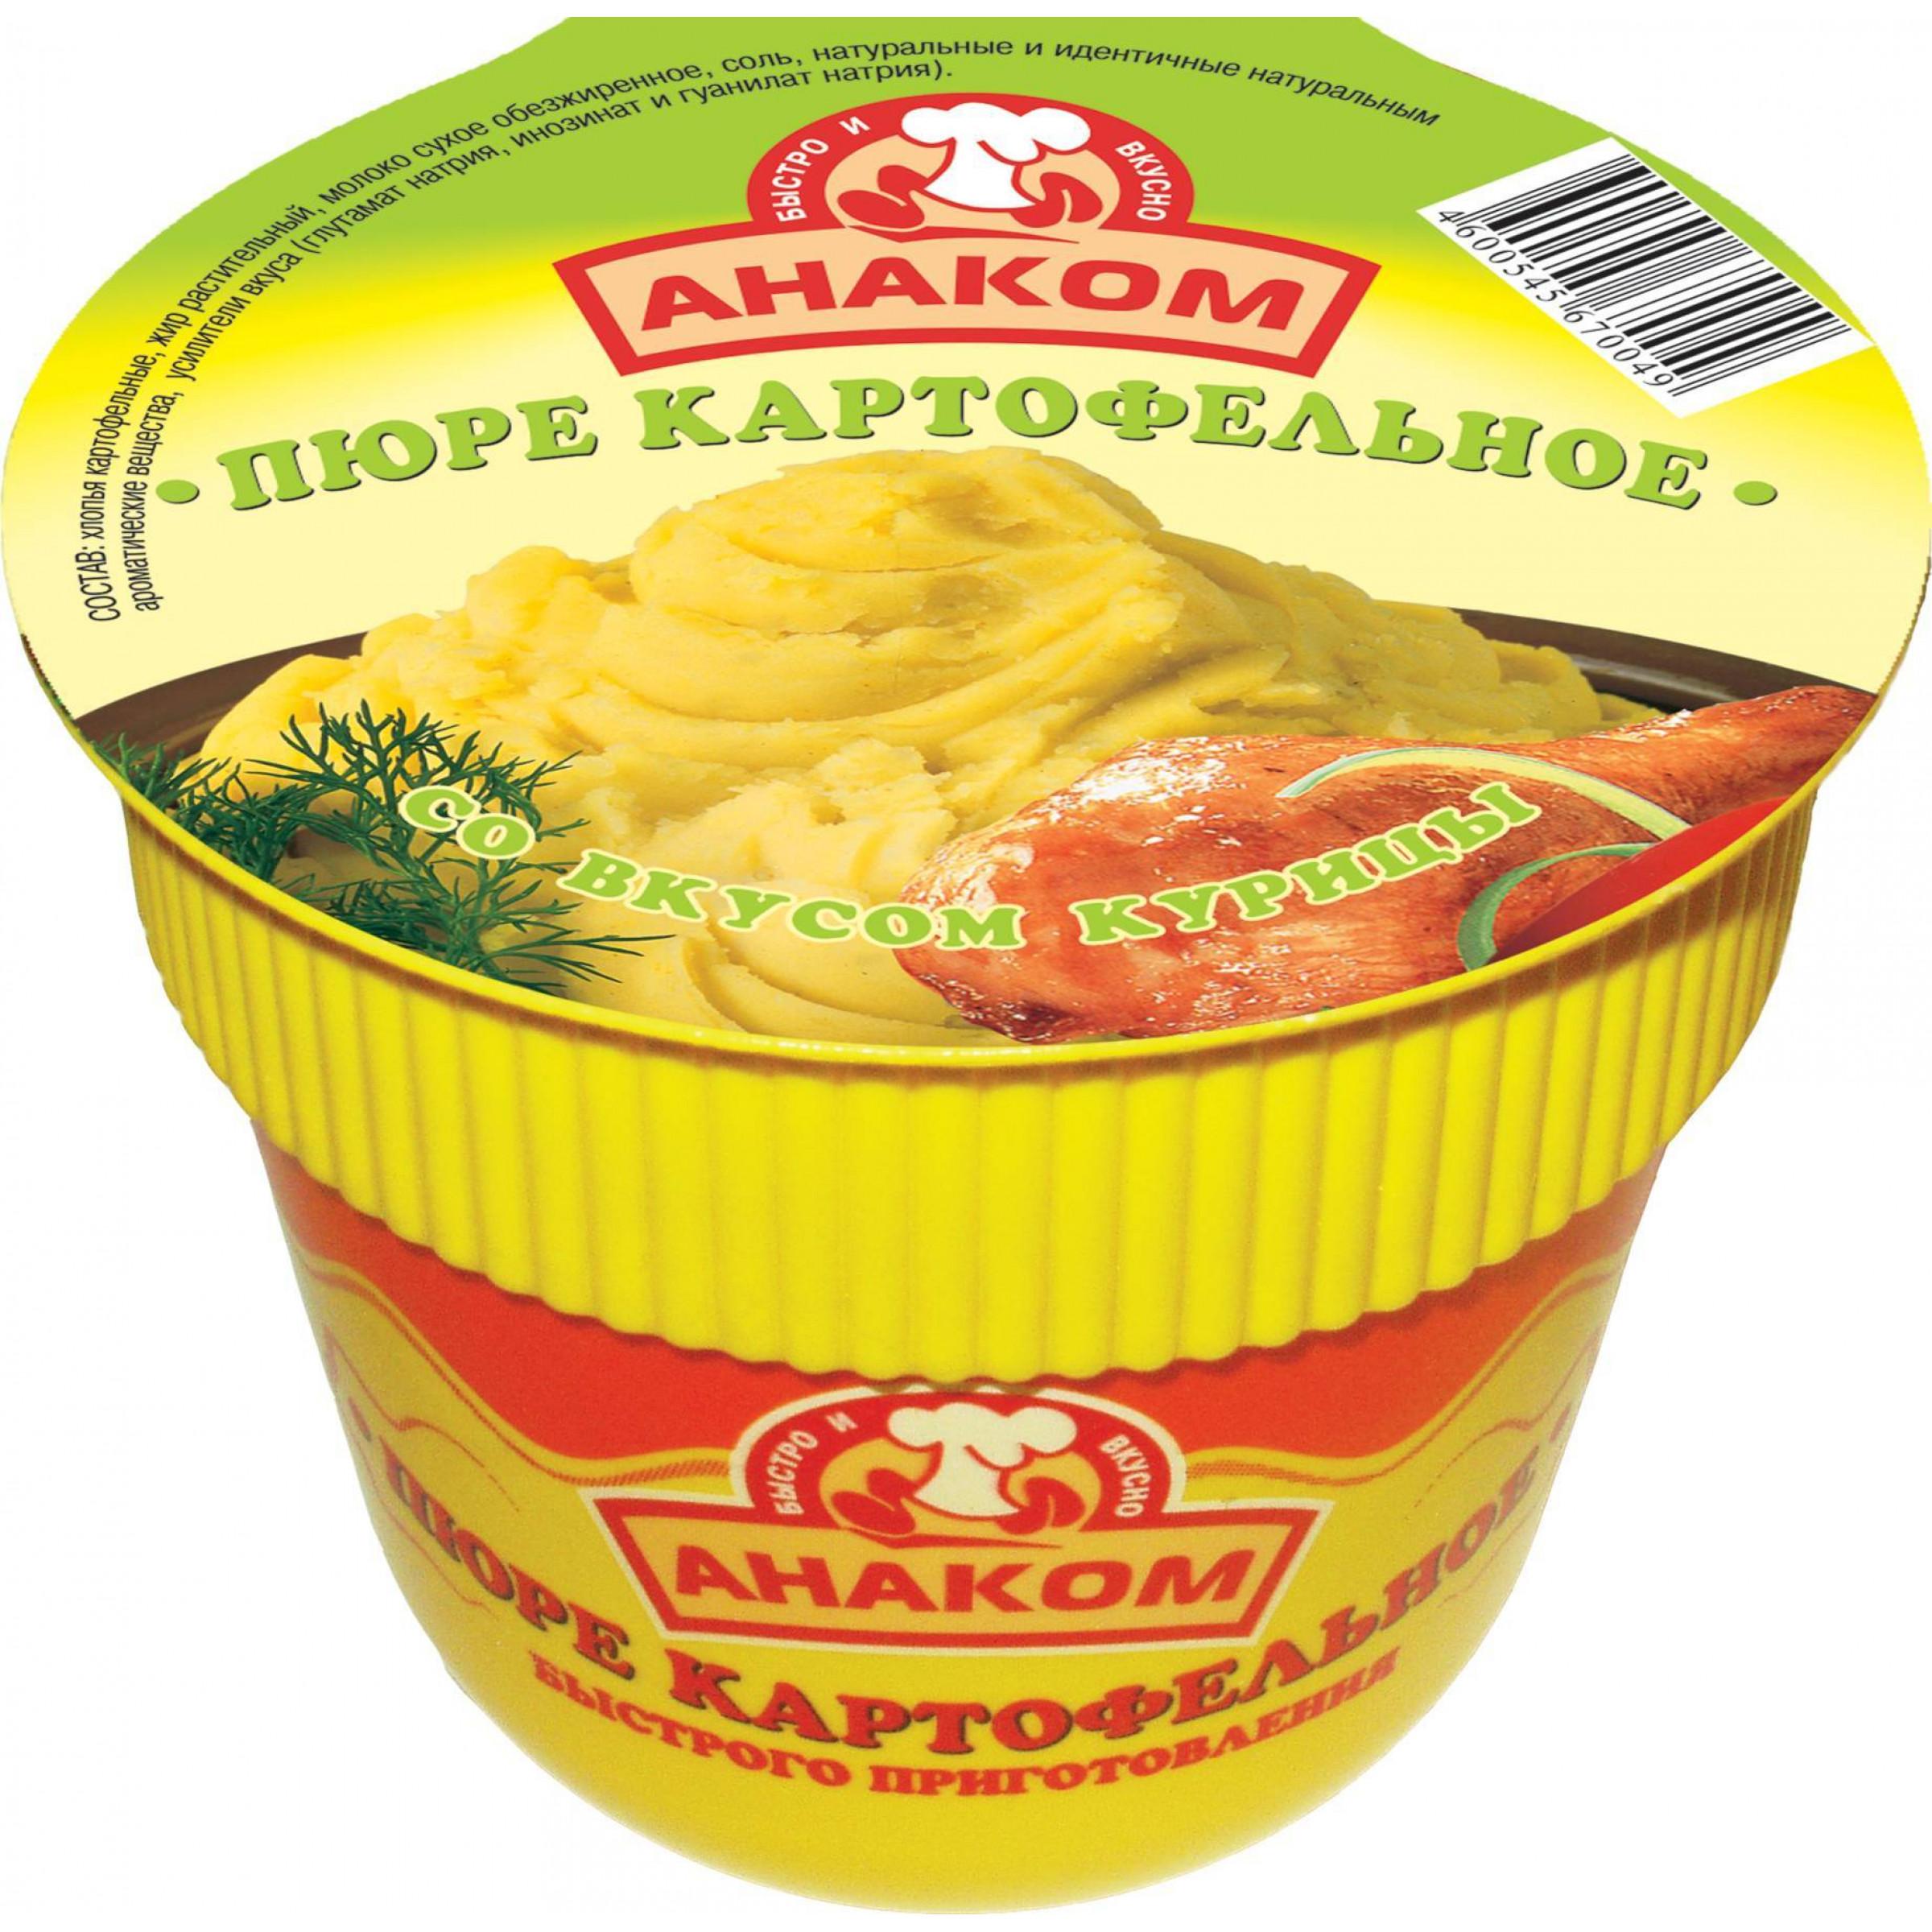 "Картофельное пюре ""Анаком"" курица, 40гр"